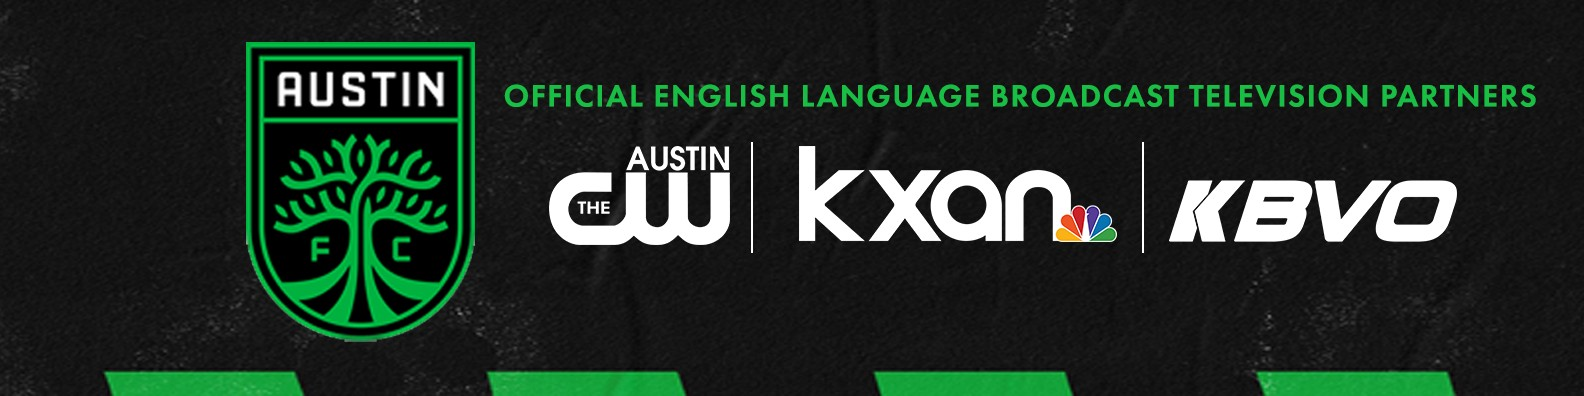 KXAN-TV | LinkedIn